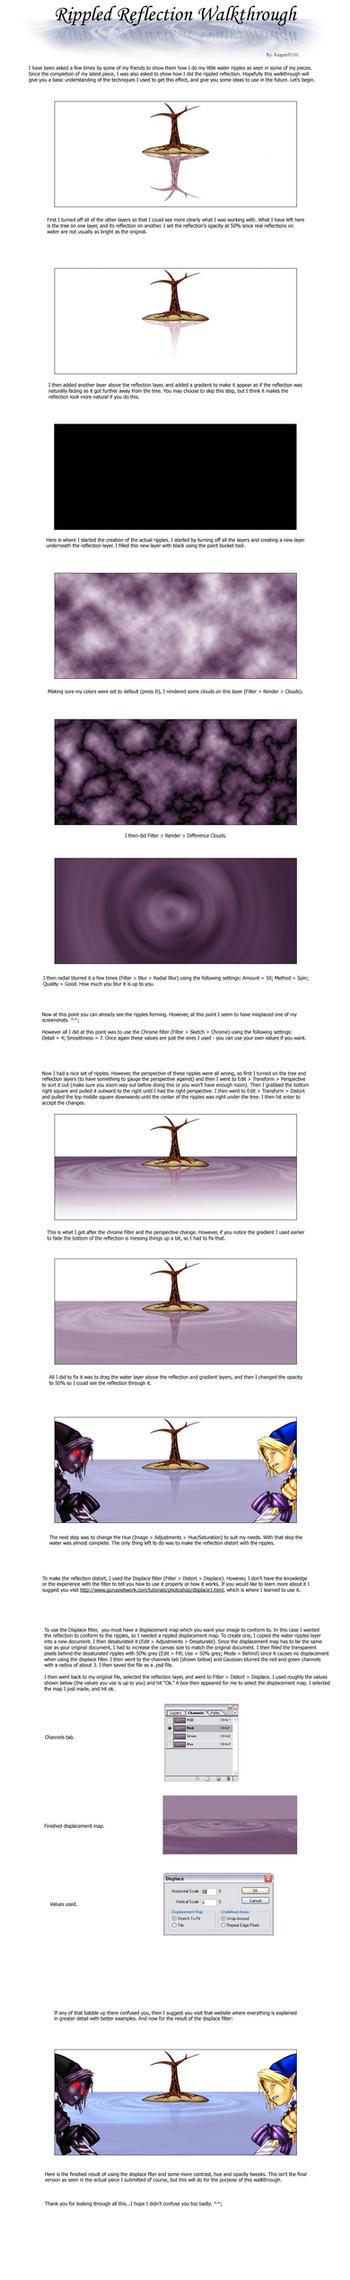 Rippled Reflection Walkthrough by ReaperXVIII